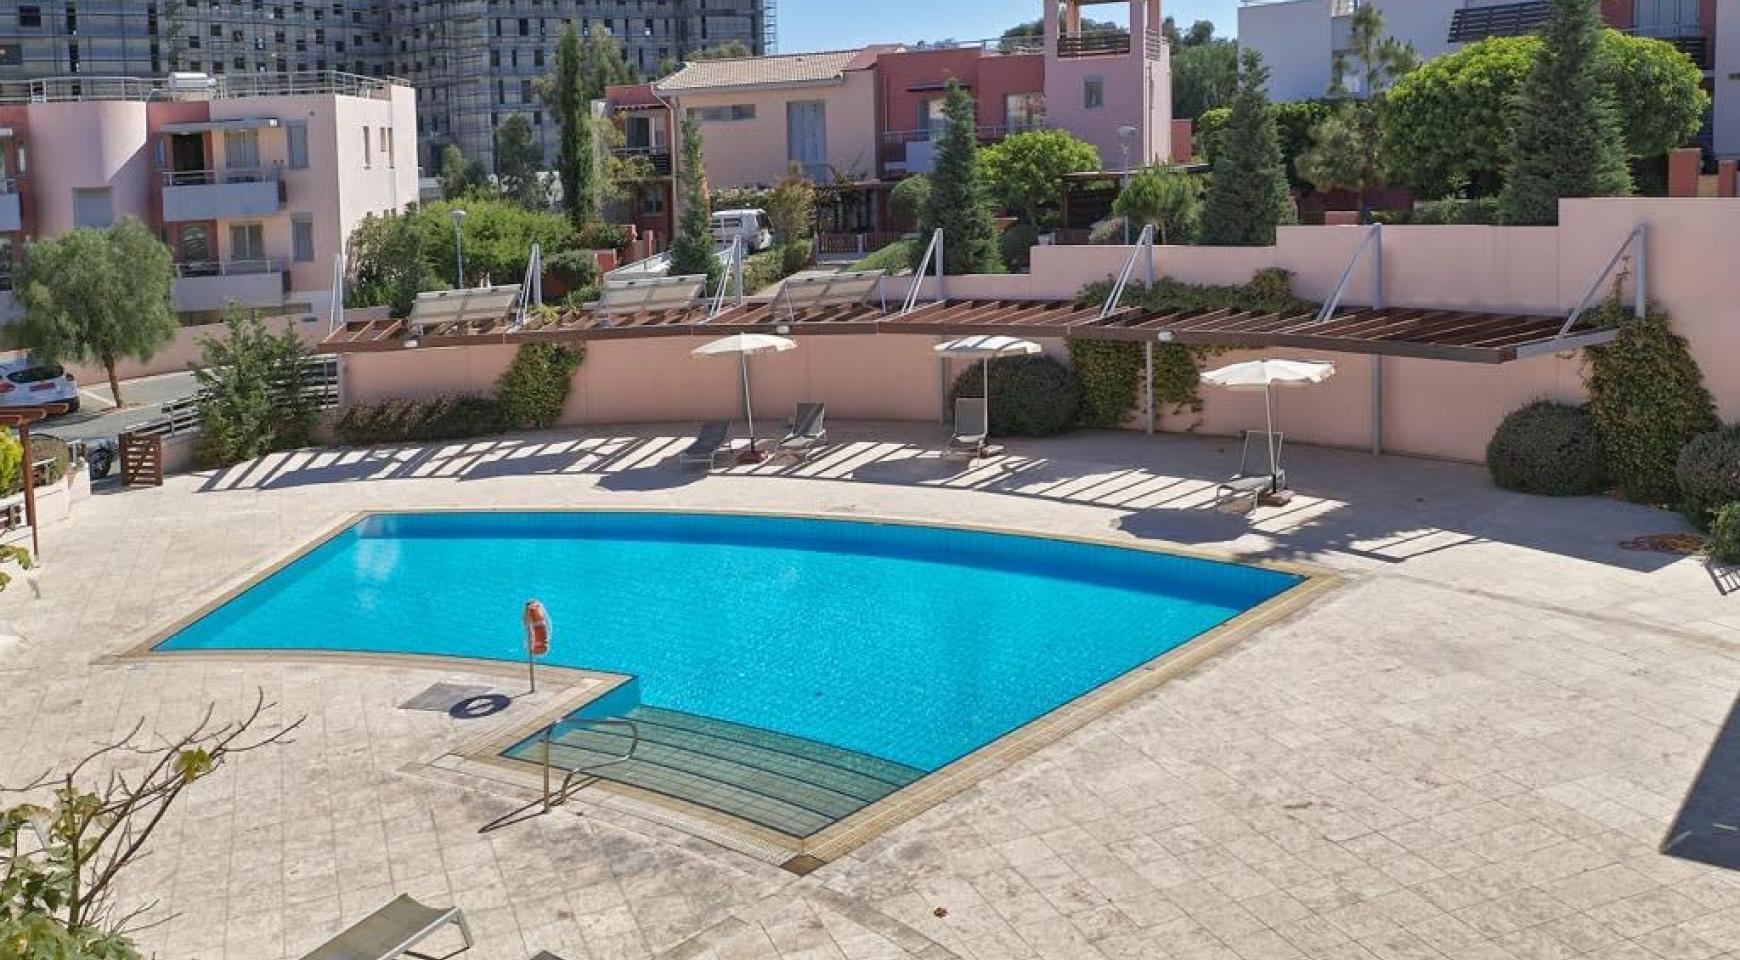 2 Bedroom Duplex Apartment Amathusa O 104 in a Prestigious Complex near the Sea  - 18